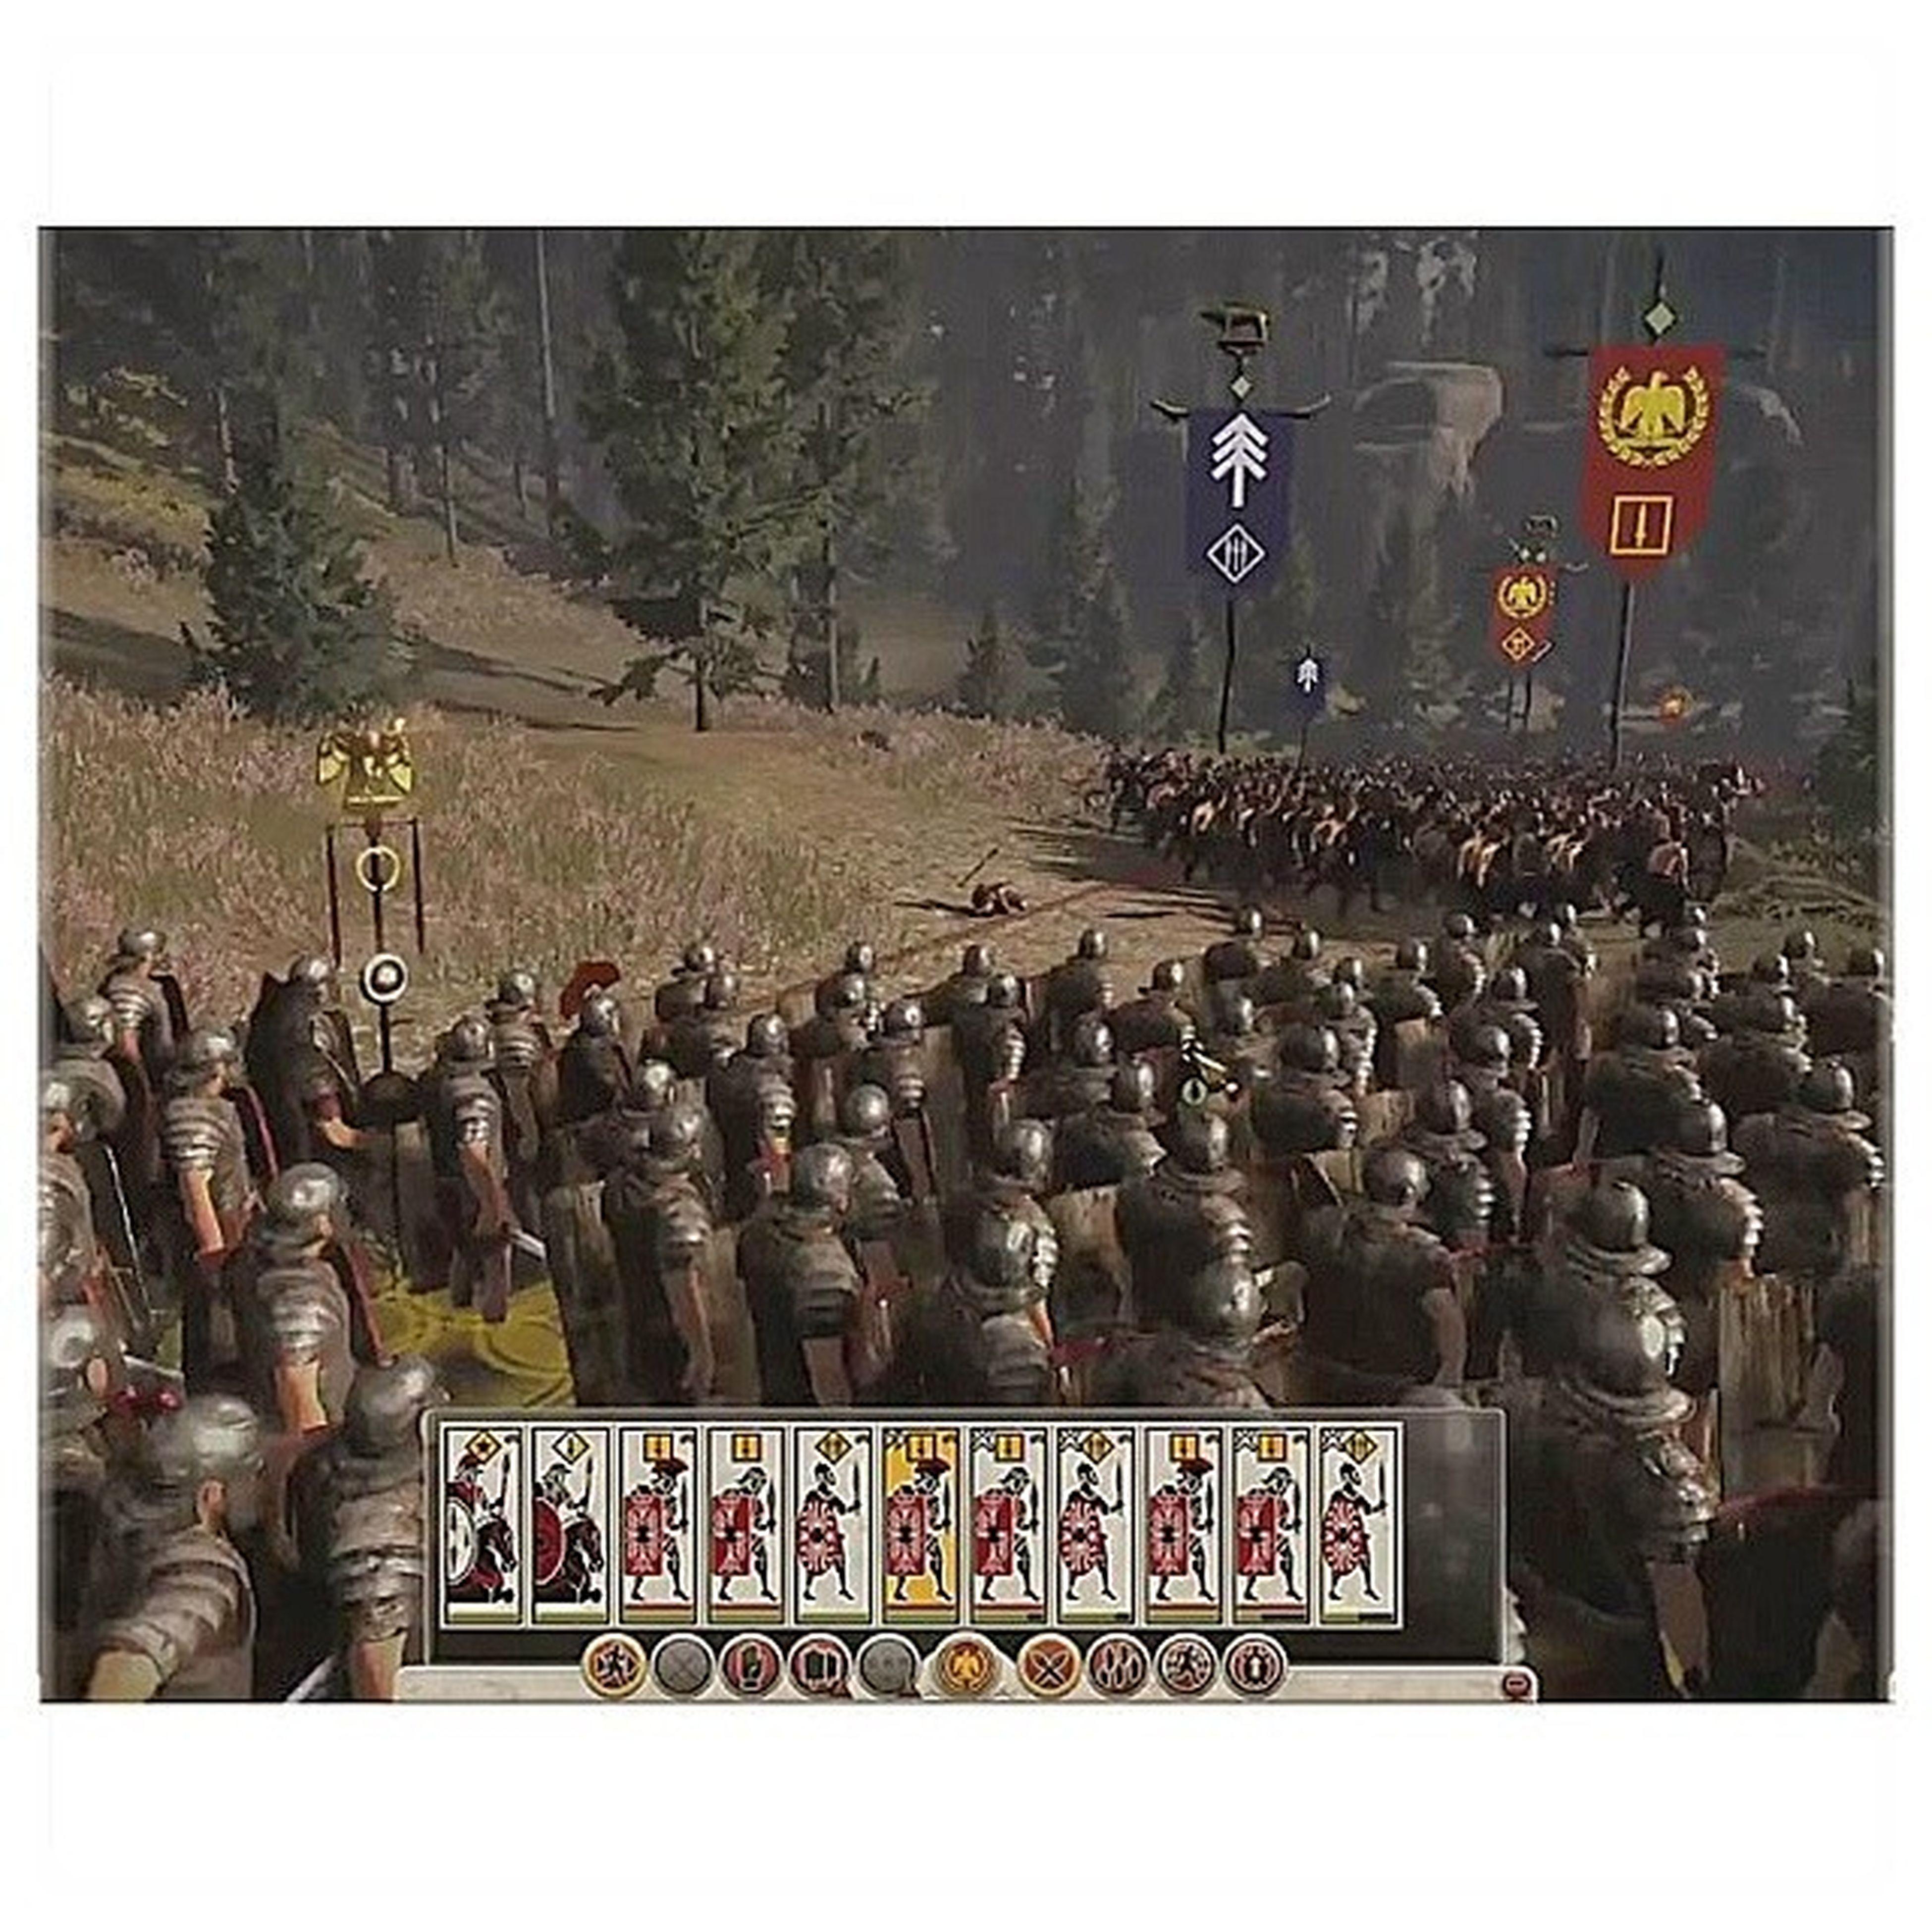 Vicio máximo al mando del Imperio Romano!! 😍💻🎮👌 TotalWarRome2 PCgame Estrategia Guerra DeLujo ComoUnEnano